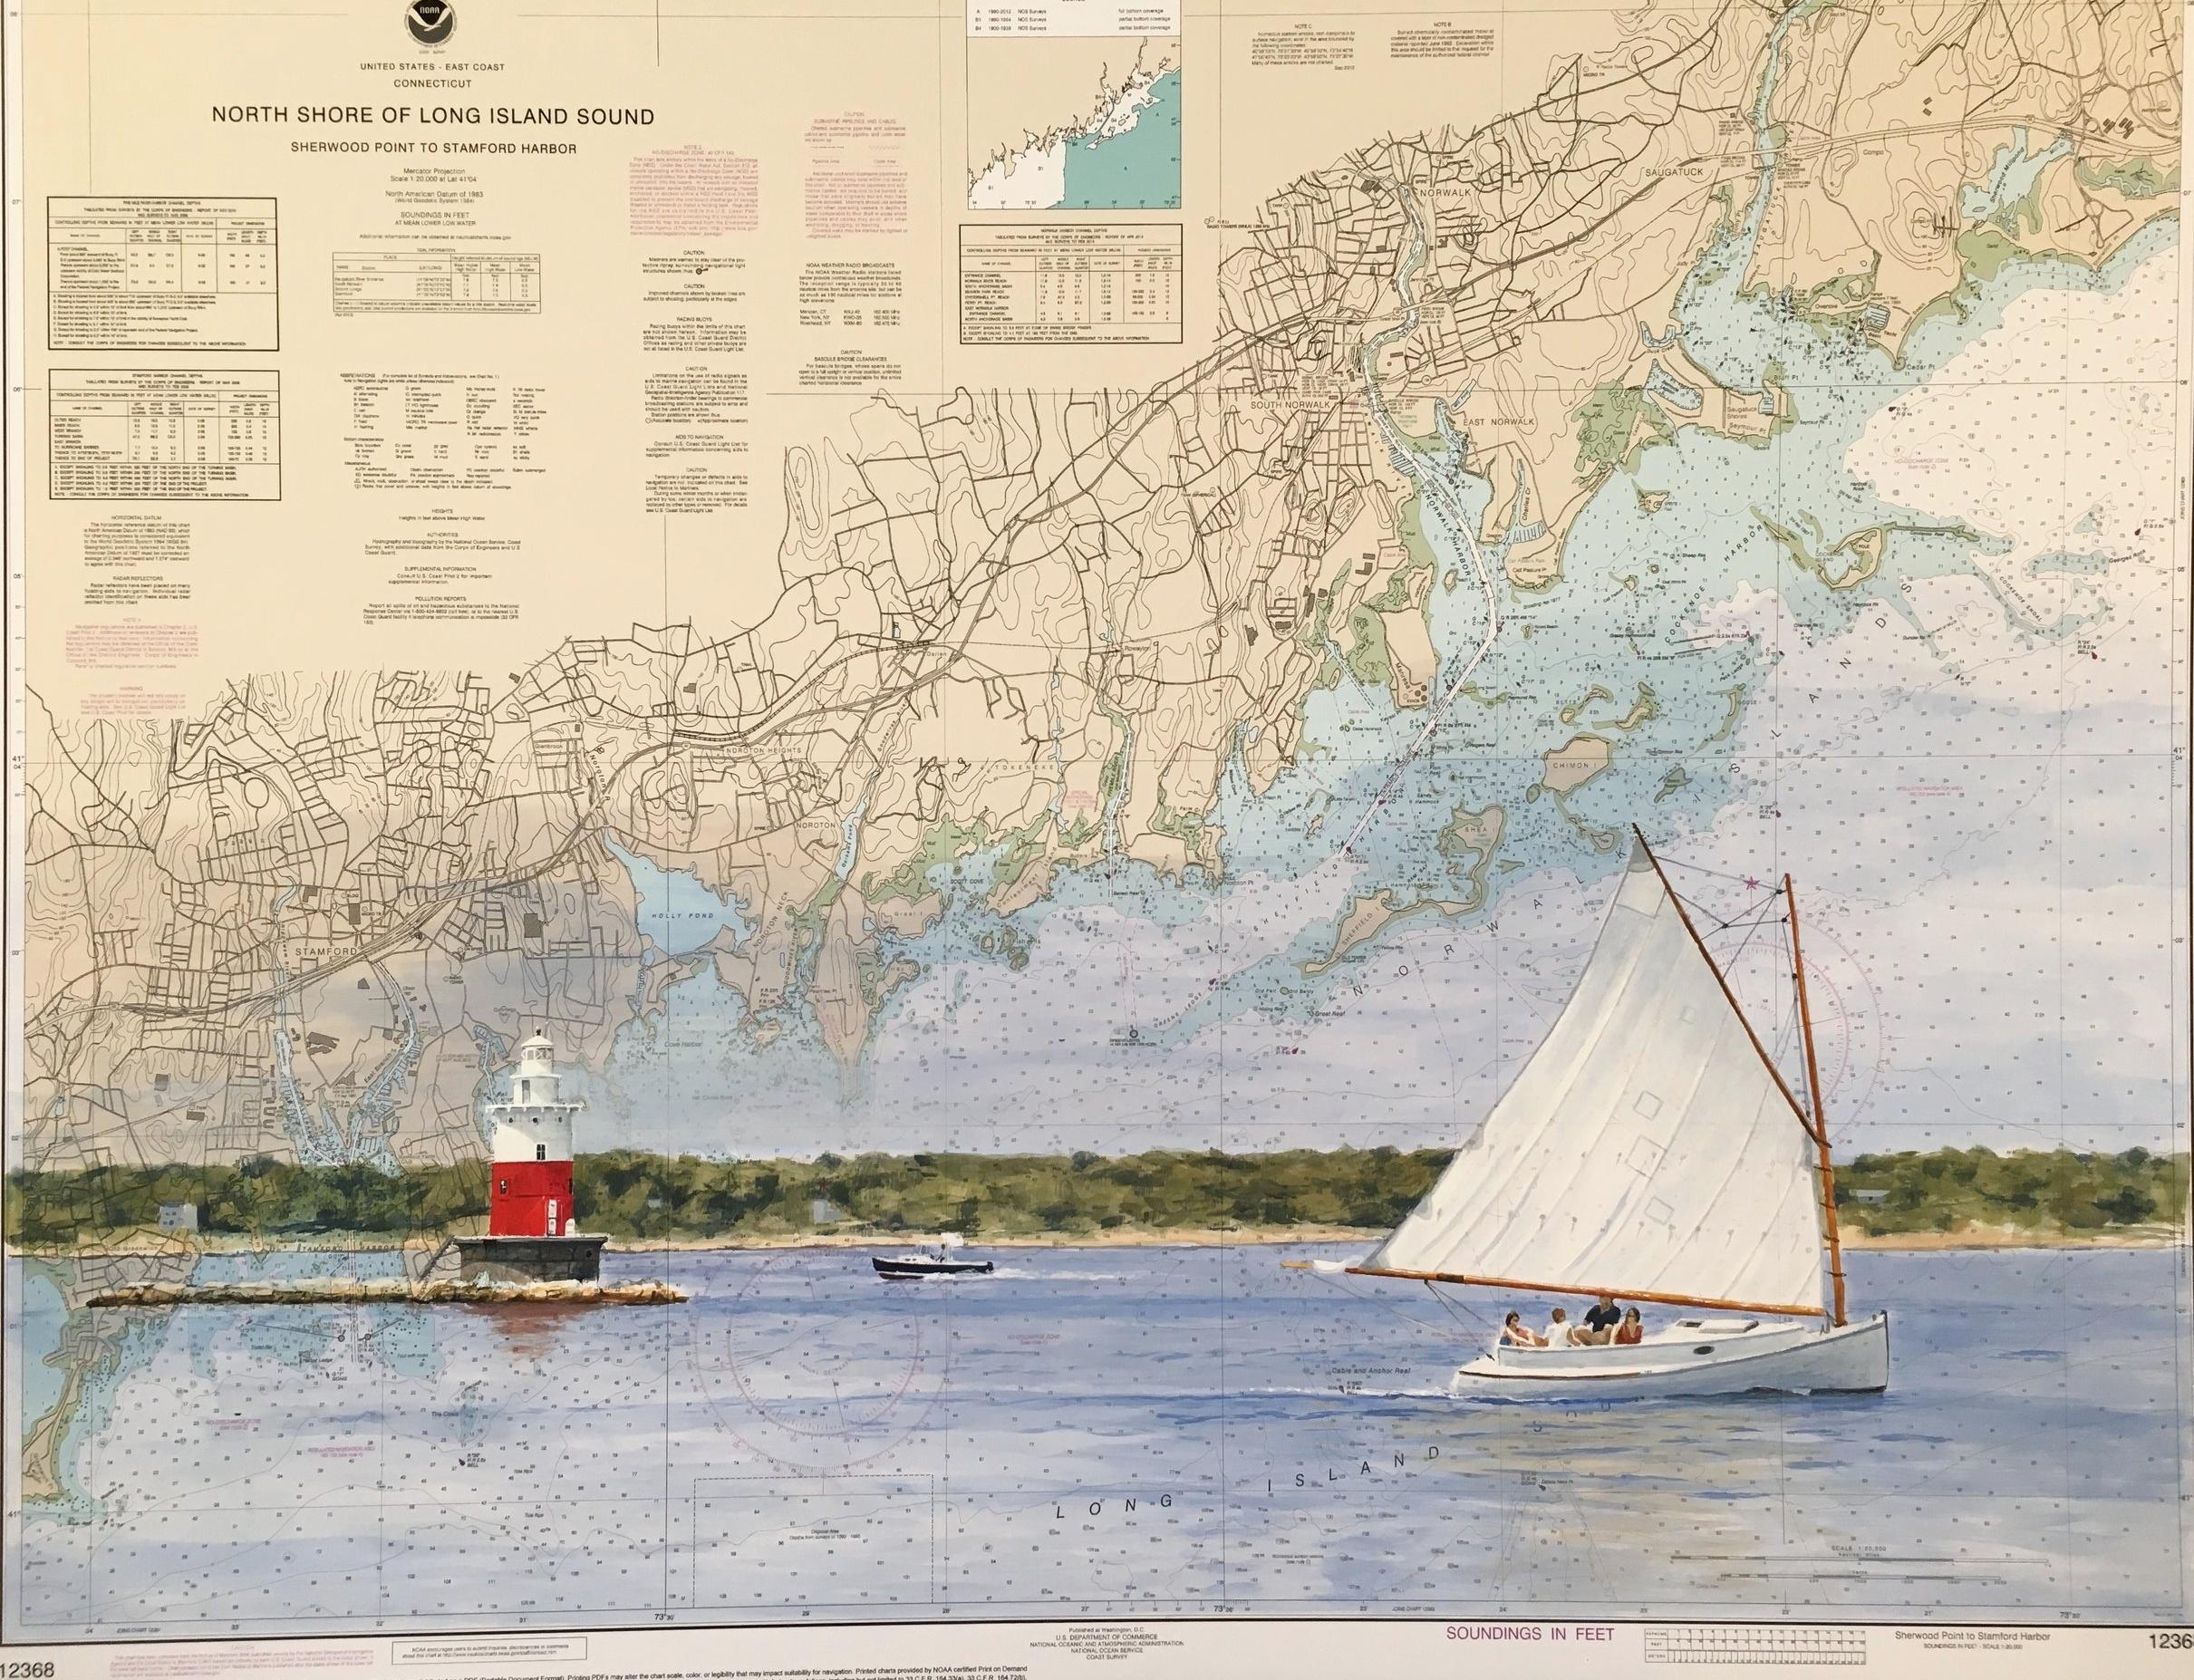 Sailing Past Greens Ledge